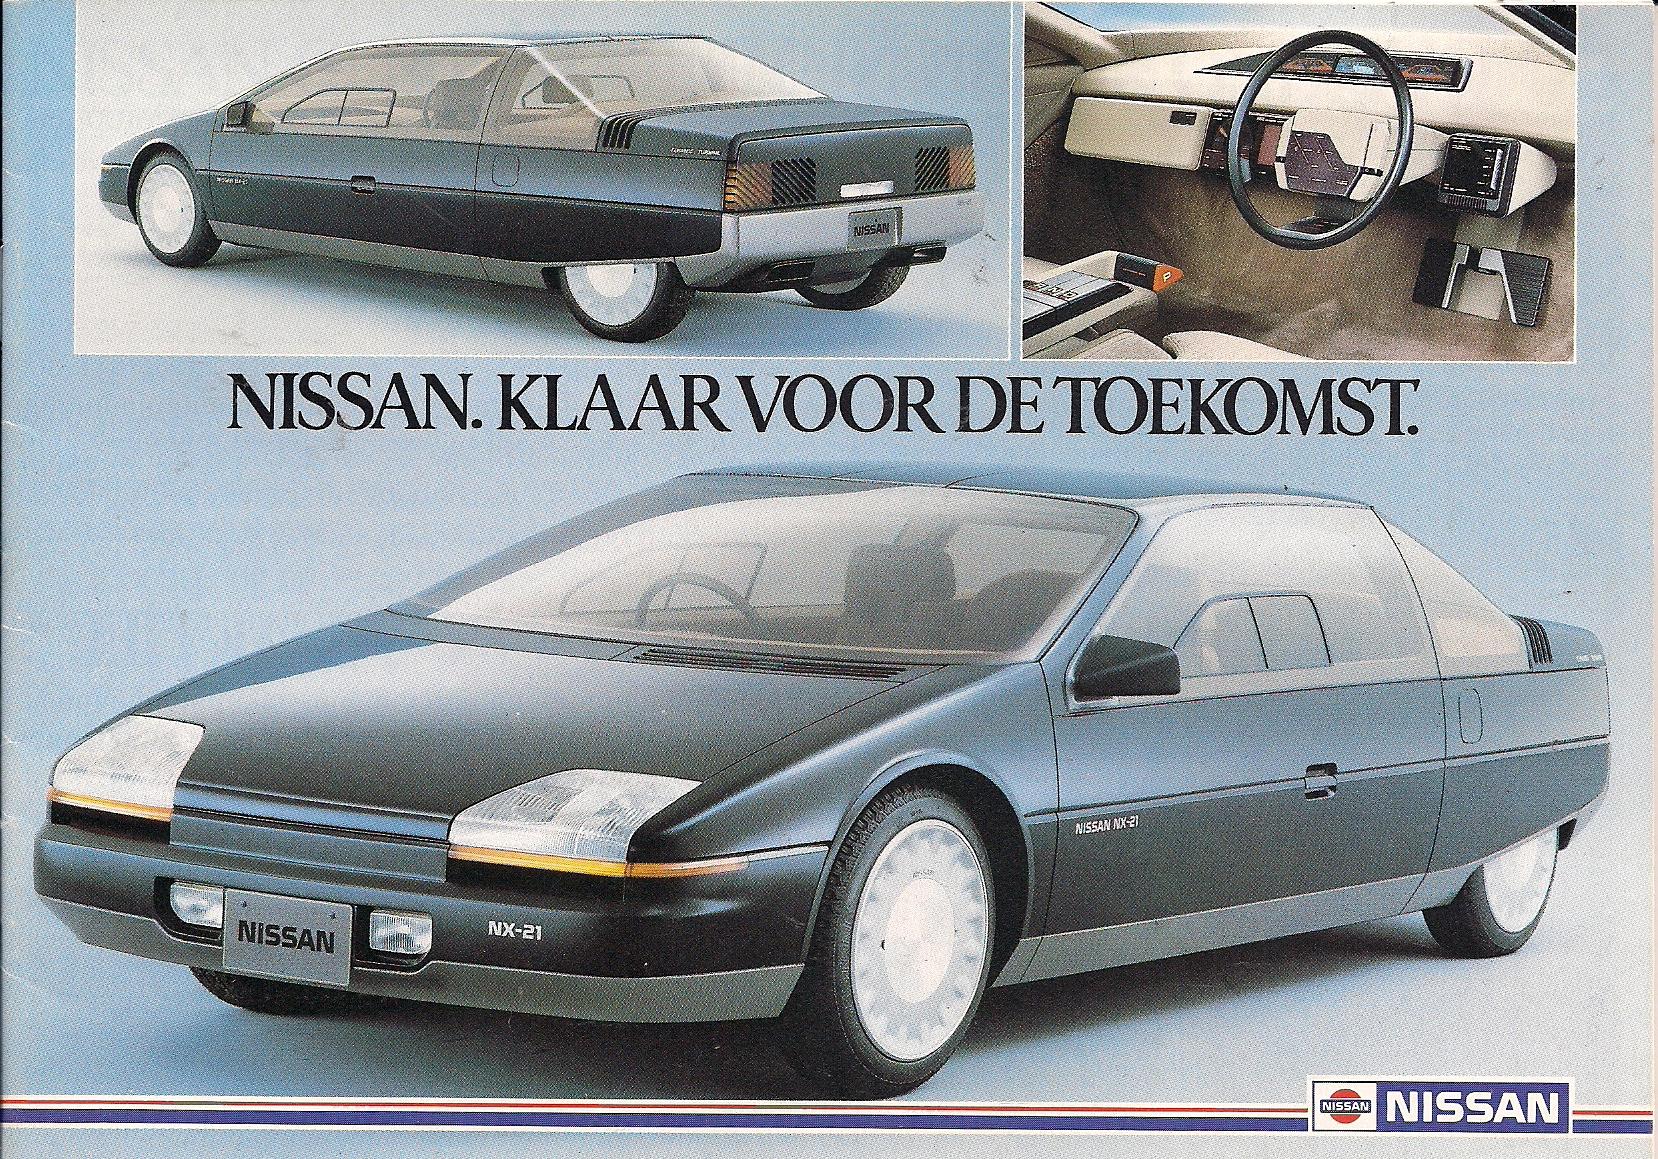 1983 nissan nx 21 concepts nissan nx 21 concept 1983 vanachro Gallery